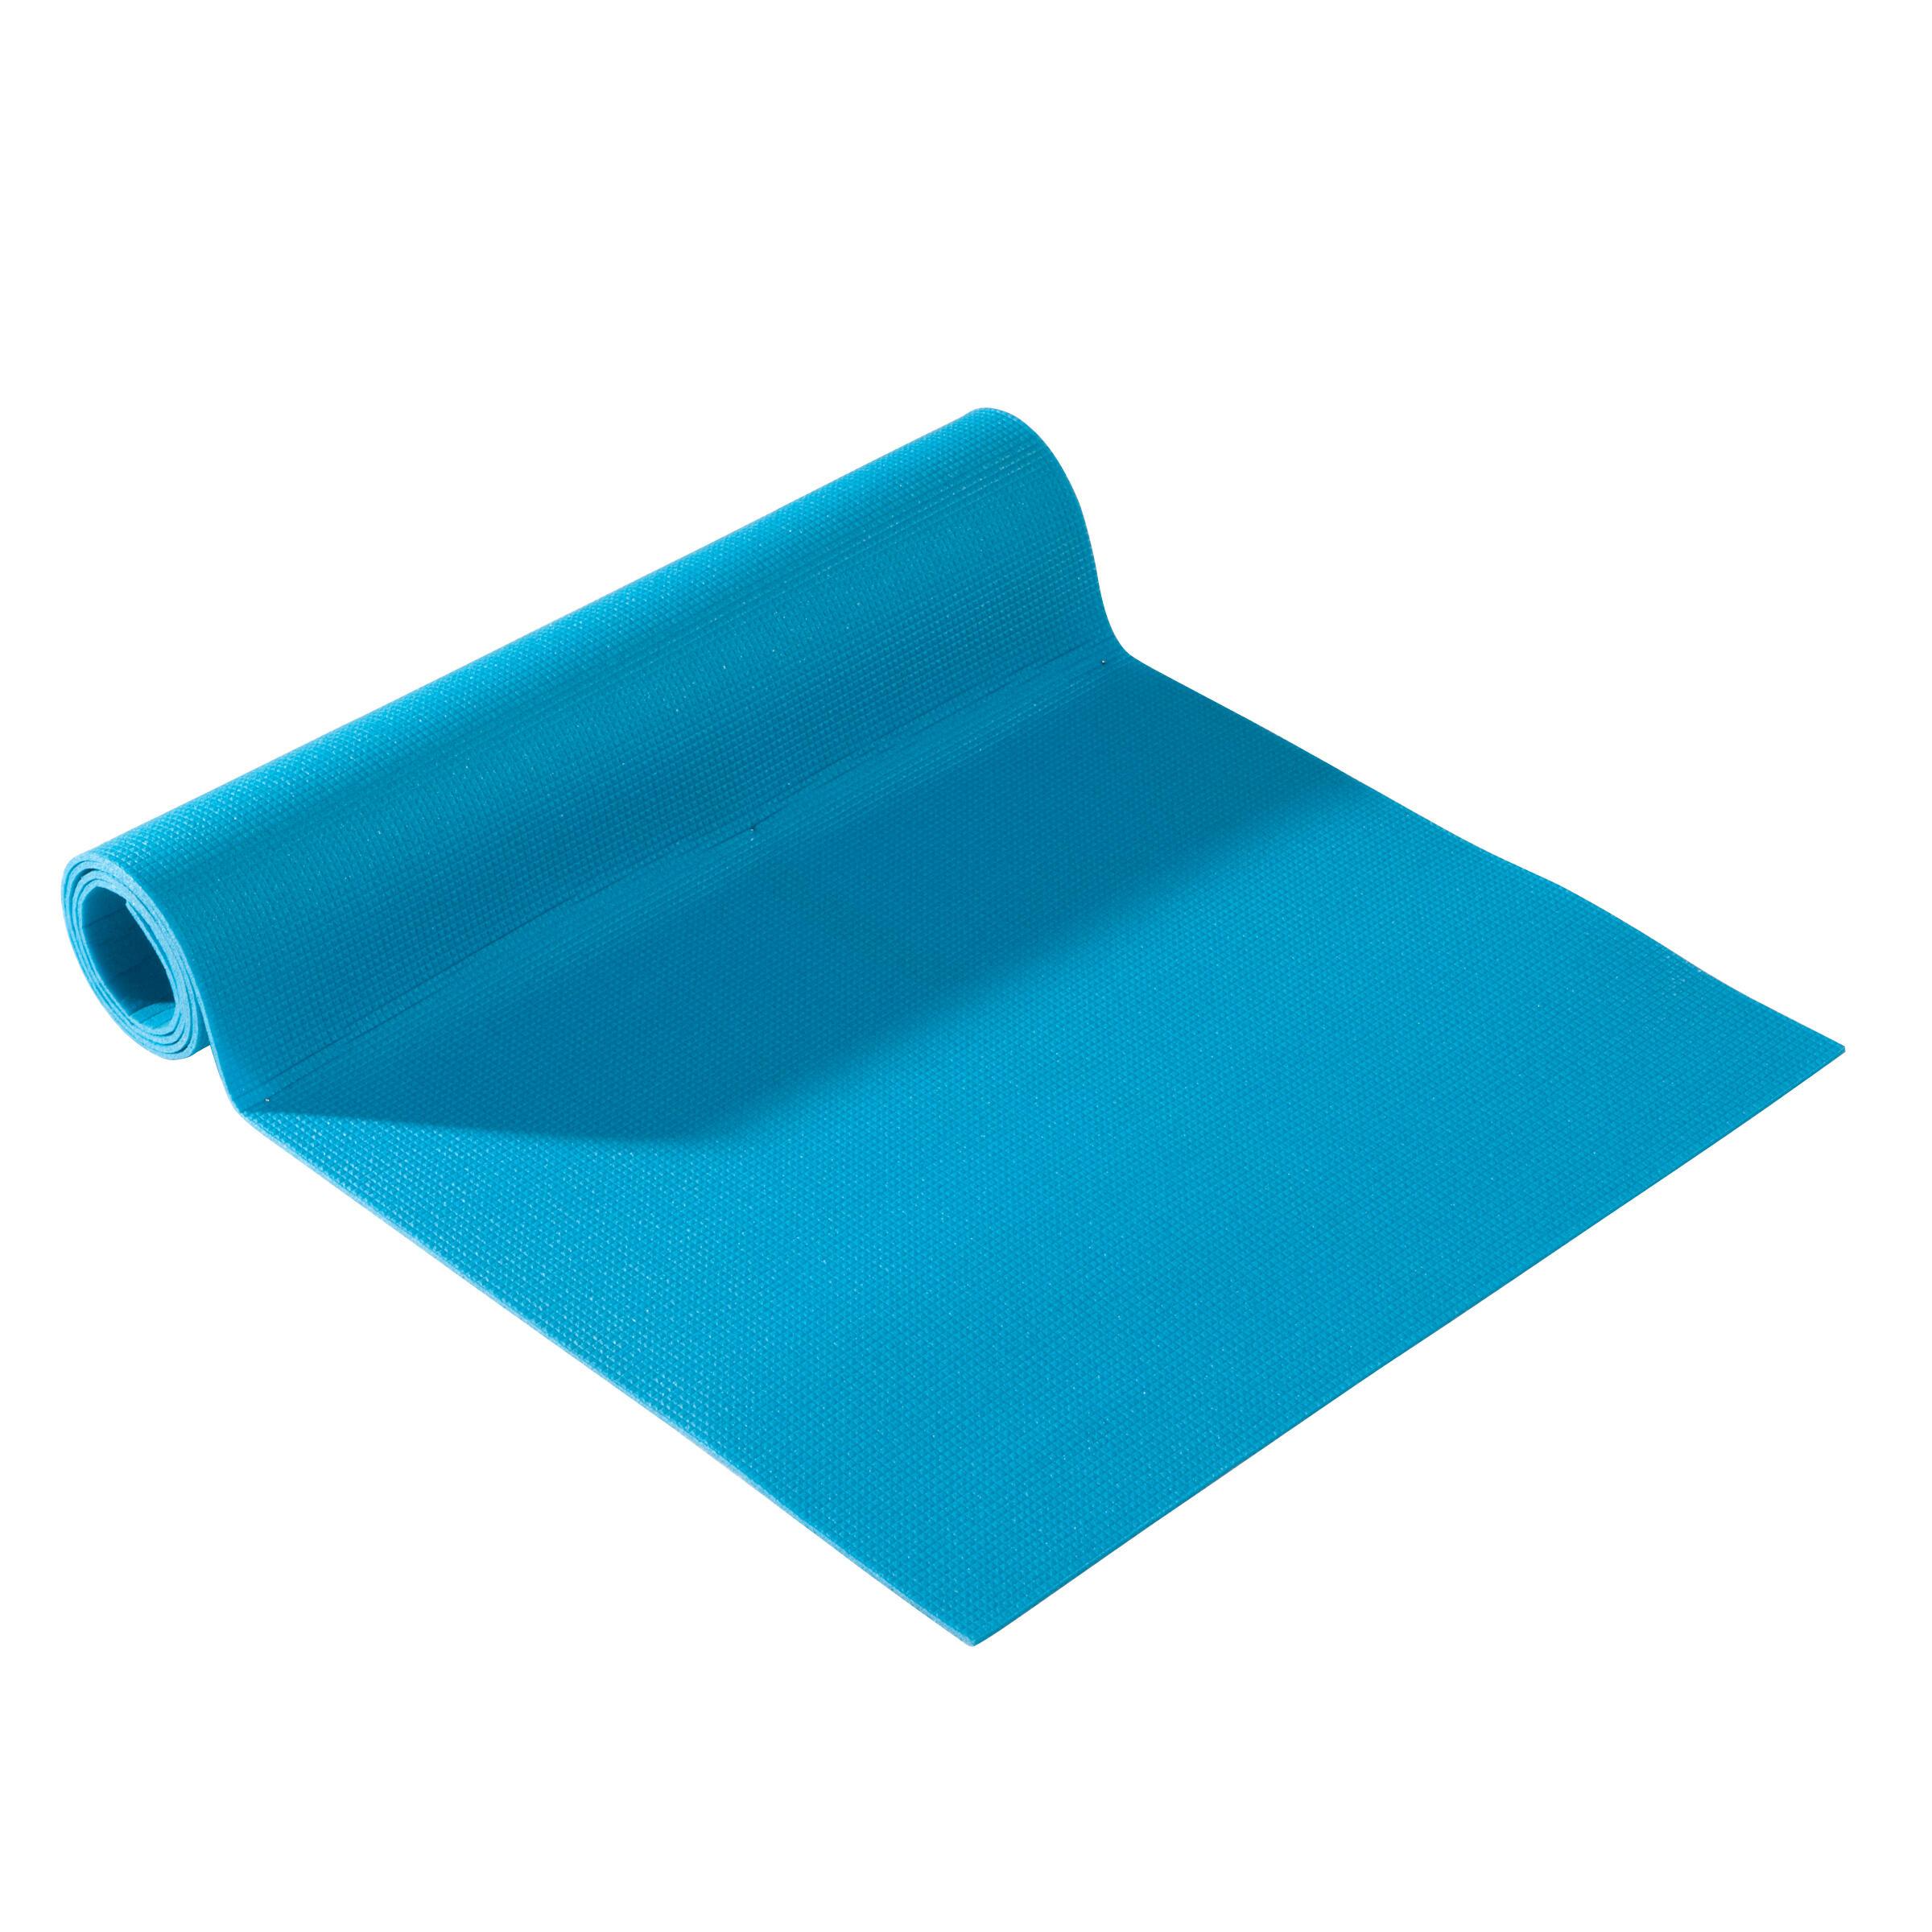 Yogamatte für sanftes Yoga Essential 4 mm blau   03608419198577